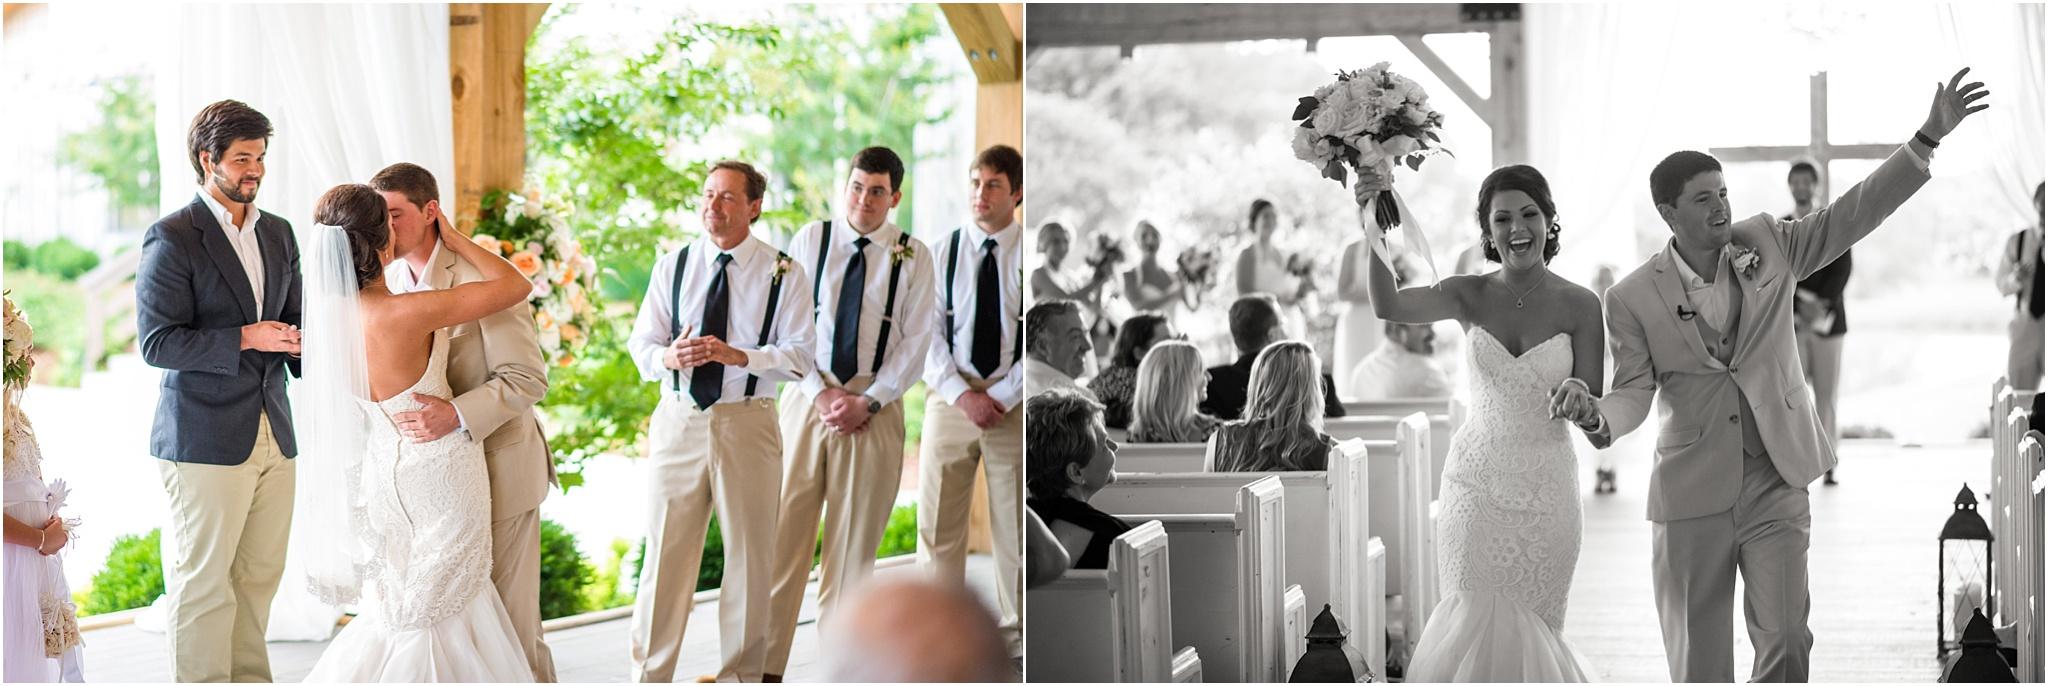 Greg Smit Photography Nashville wedding photographer Mint Springs Farm 16